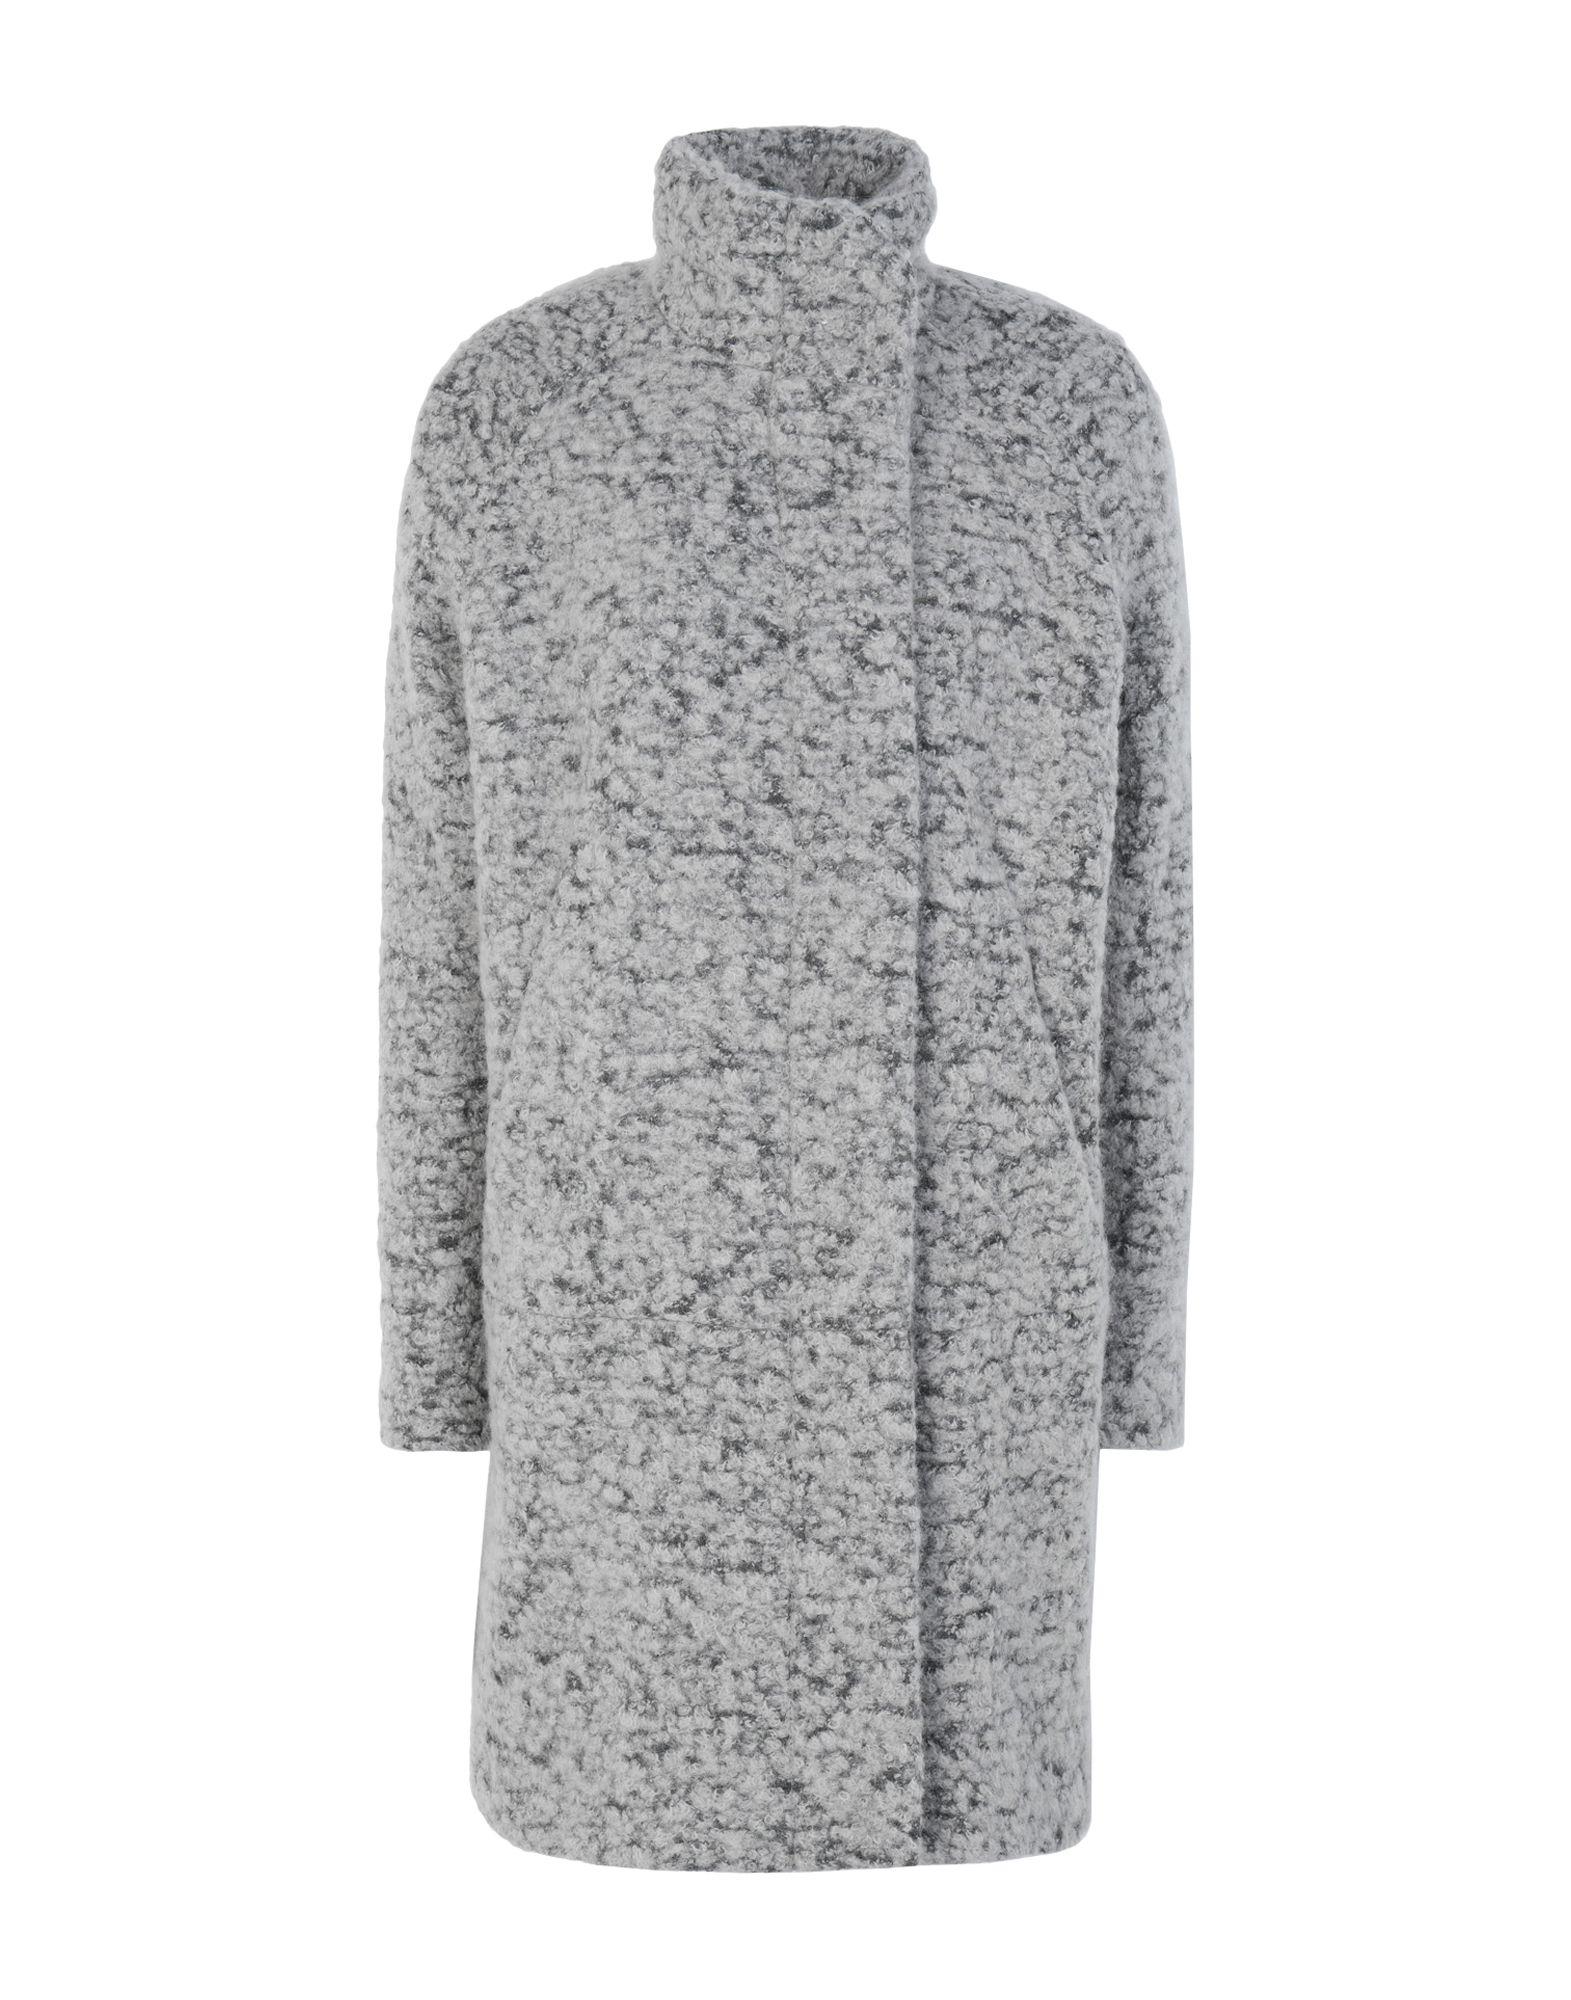 Samsøe 6182 Mäntel Hoff Damen Mantel Jacket Φ 2YI9EWDH